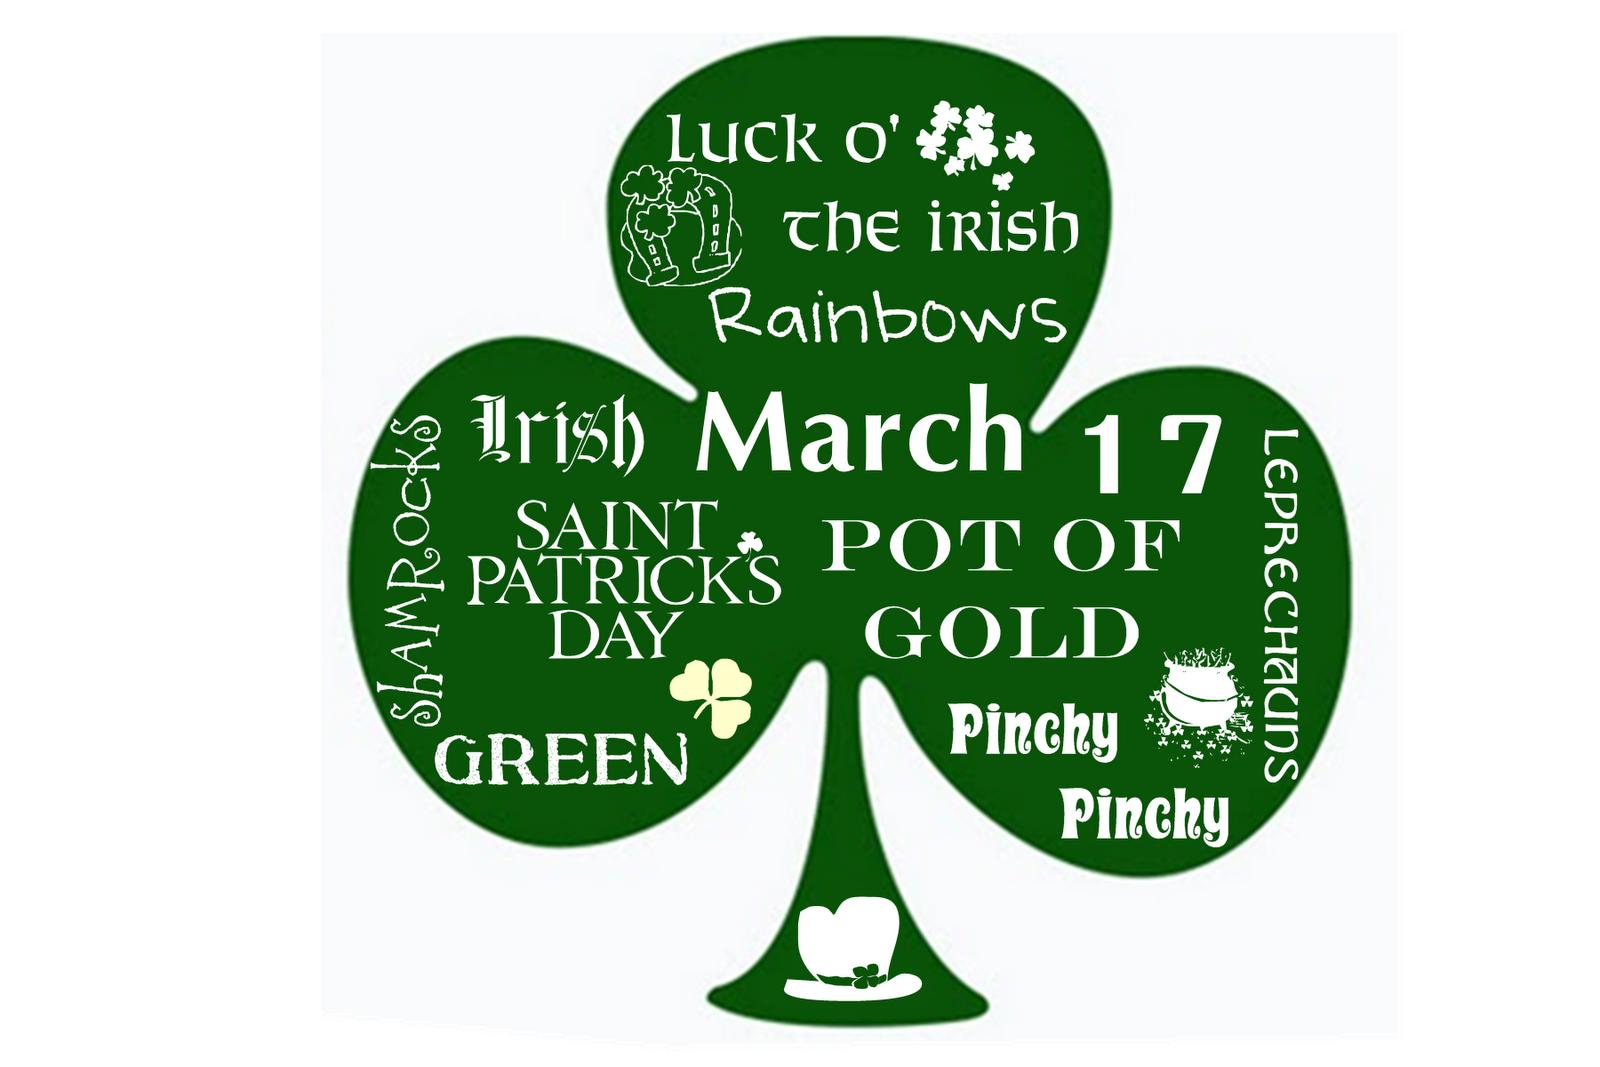 10 Steps To Celebrate St. Patrick's Day